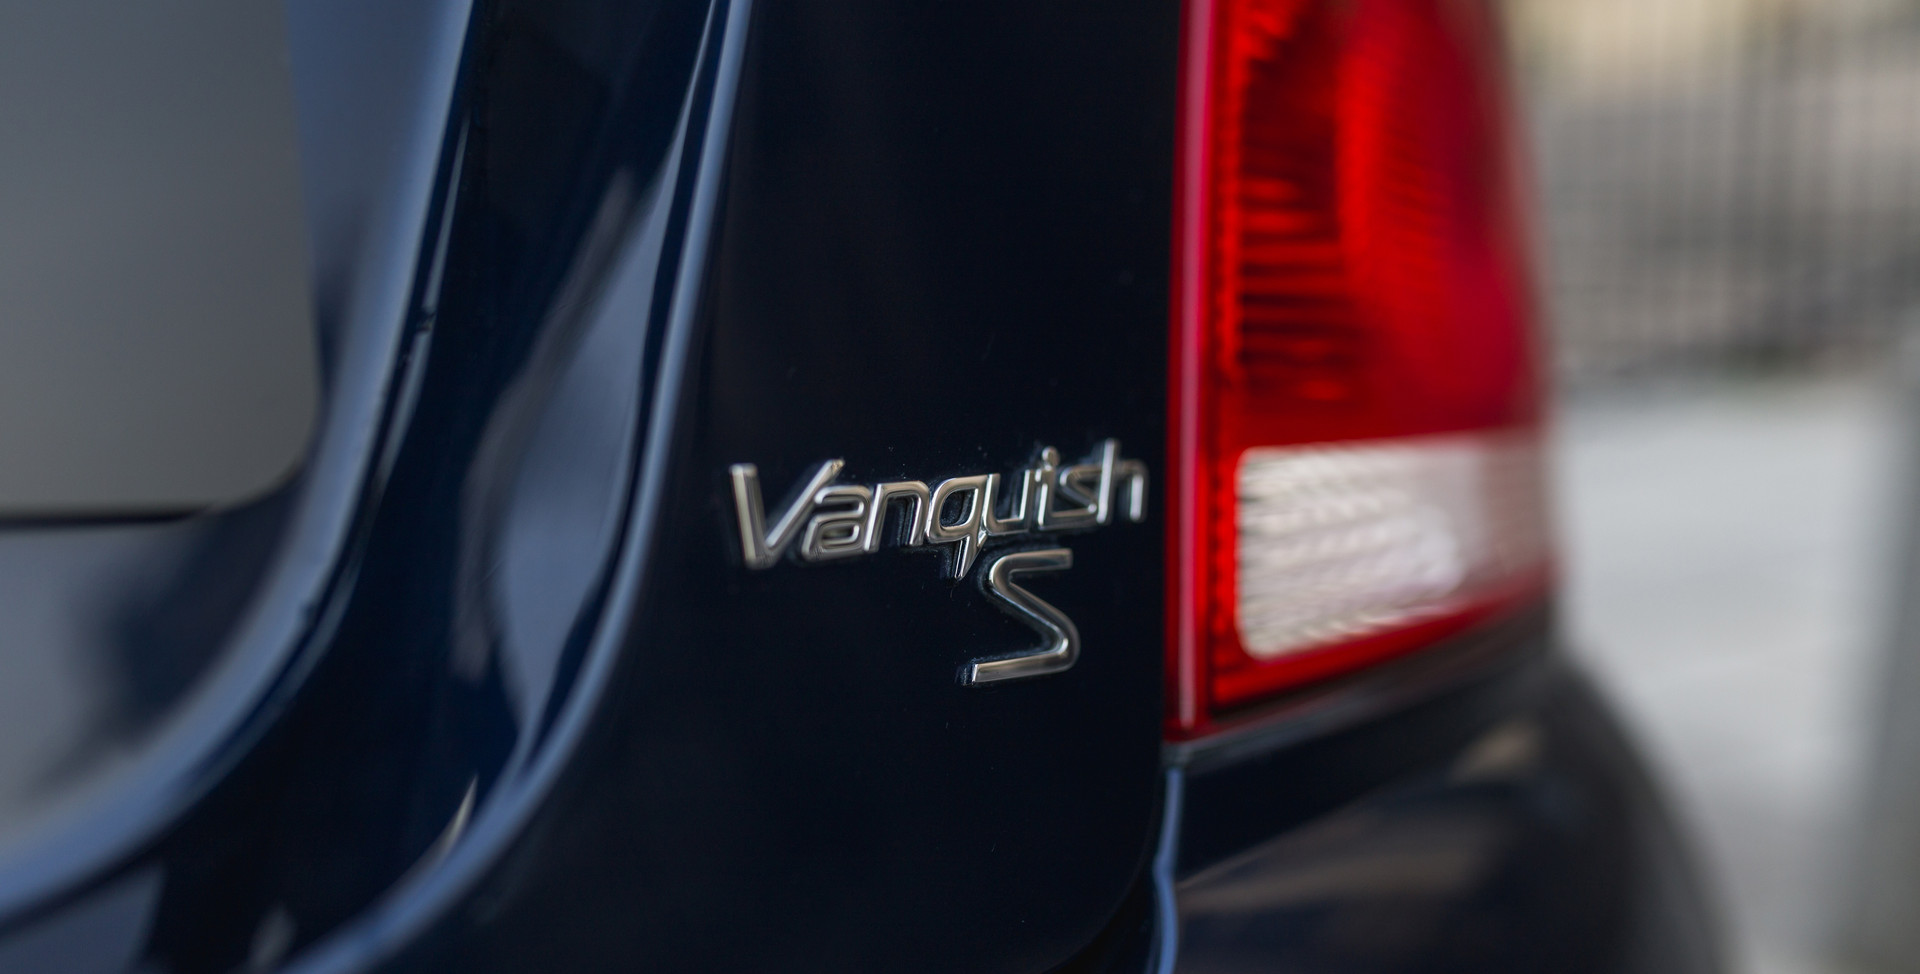 Aston Martin Vanquish S27.jpg